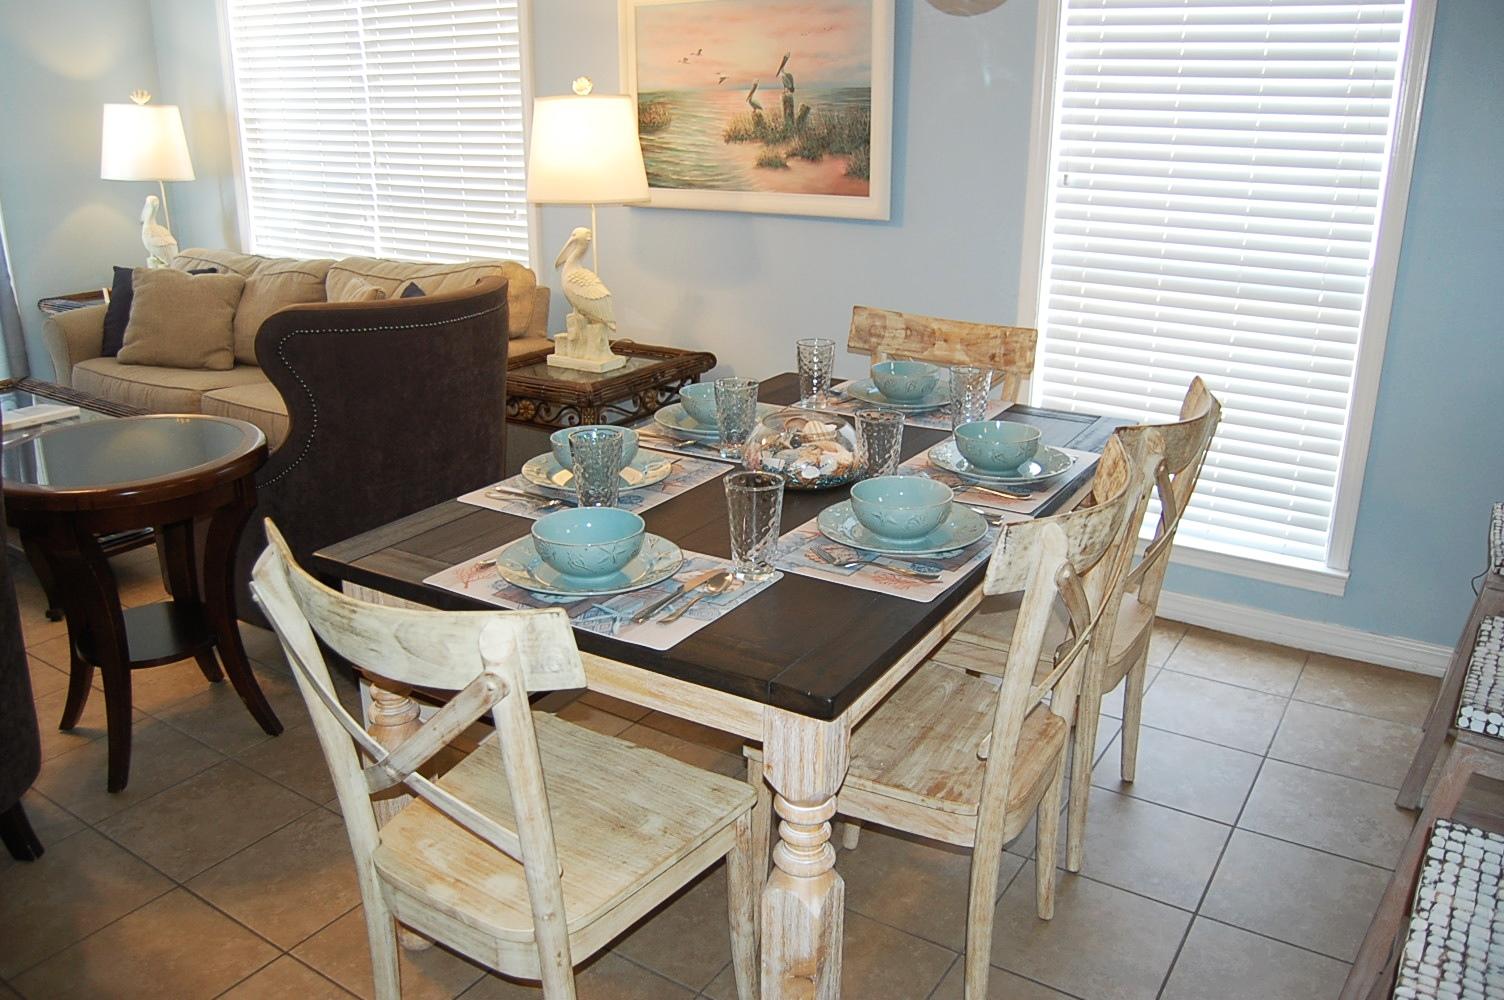 Awbrey House House/Cottage rental in Gulf Shores House Rentals in Gulf Shores Alabama - #14